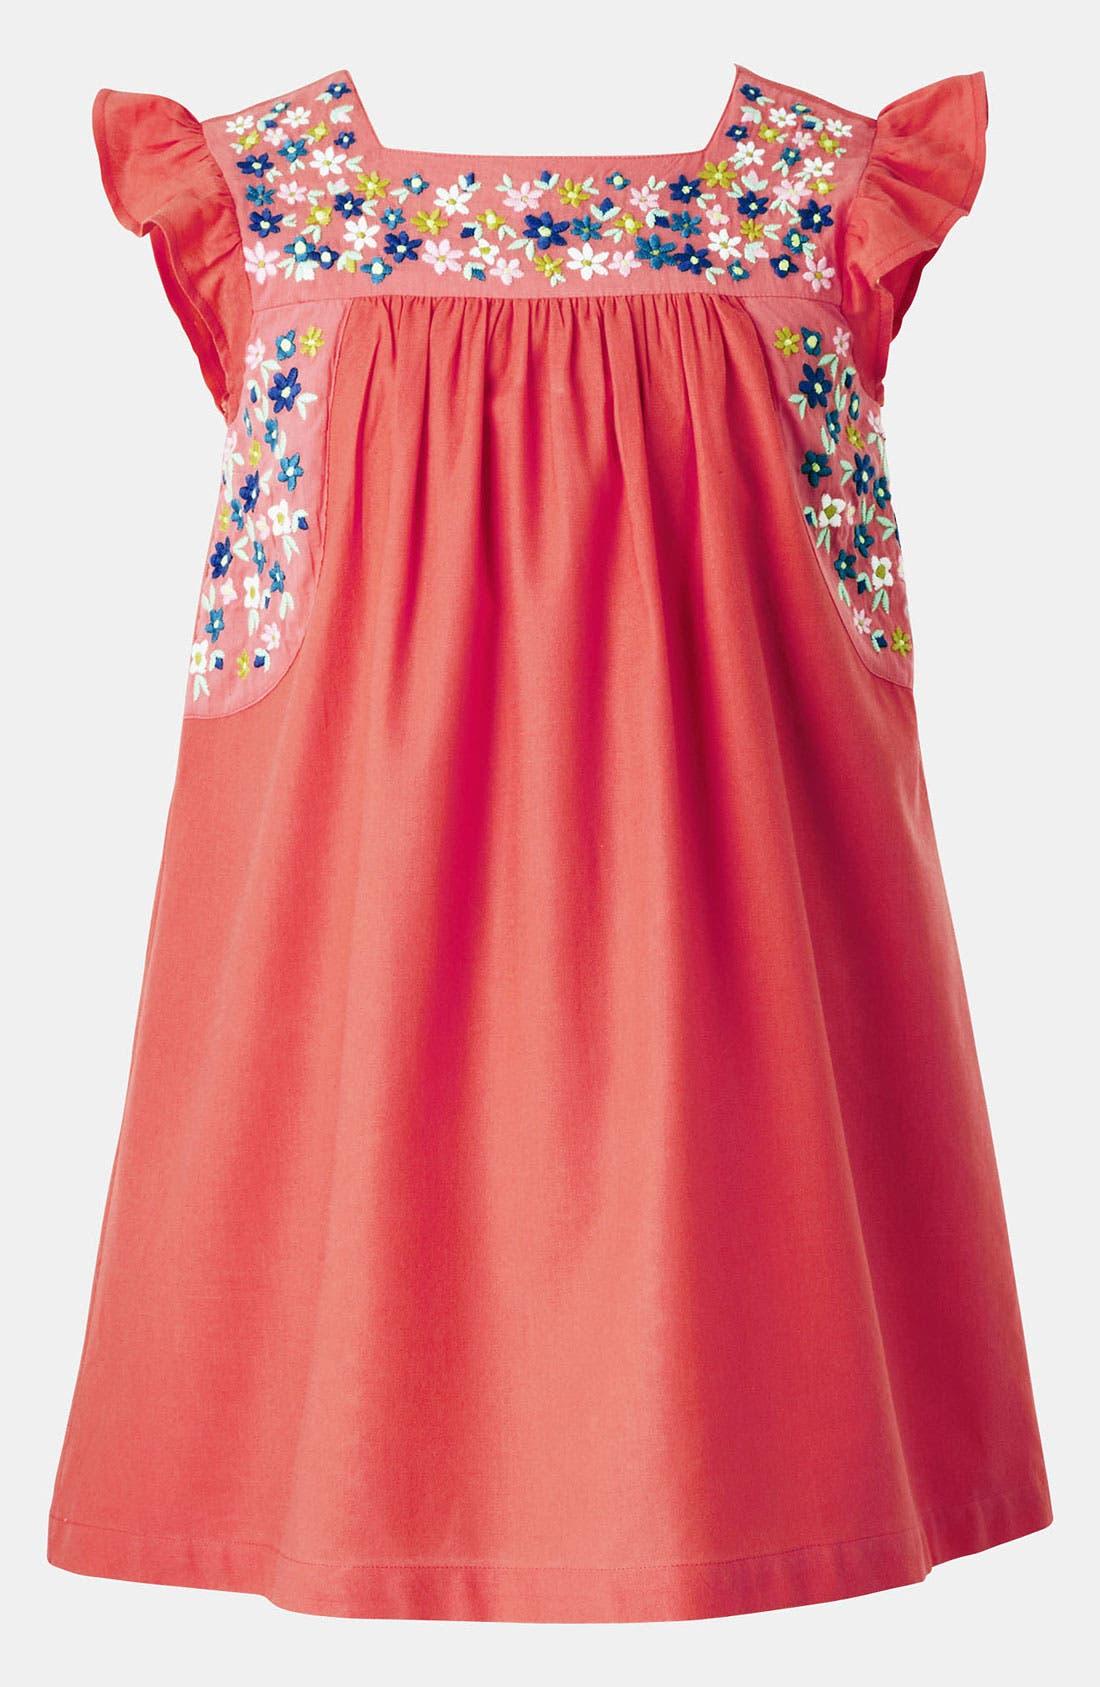 Main Image - Mini Boden Embroidered Dress (Big Girls)